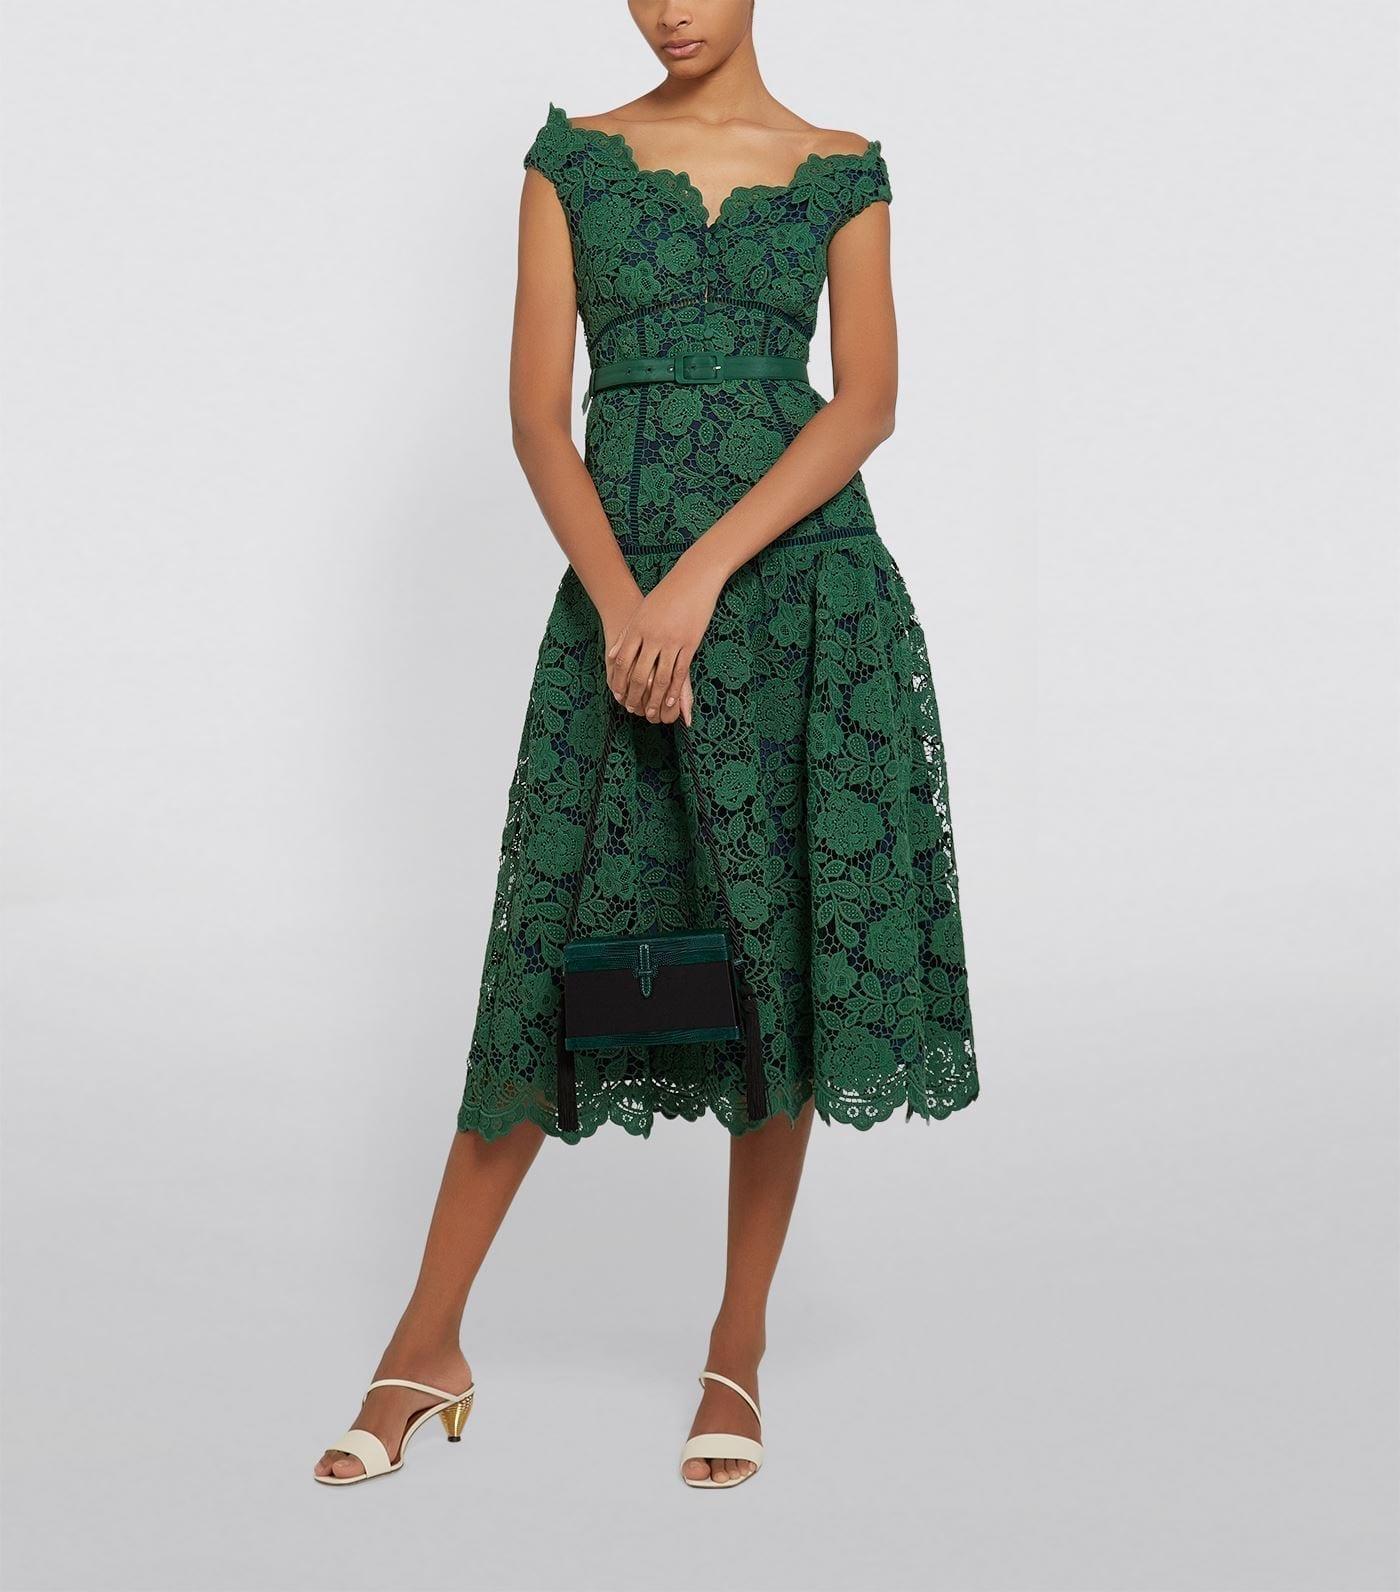 SELF-PORTRAIT Belted Lace Midi Dress